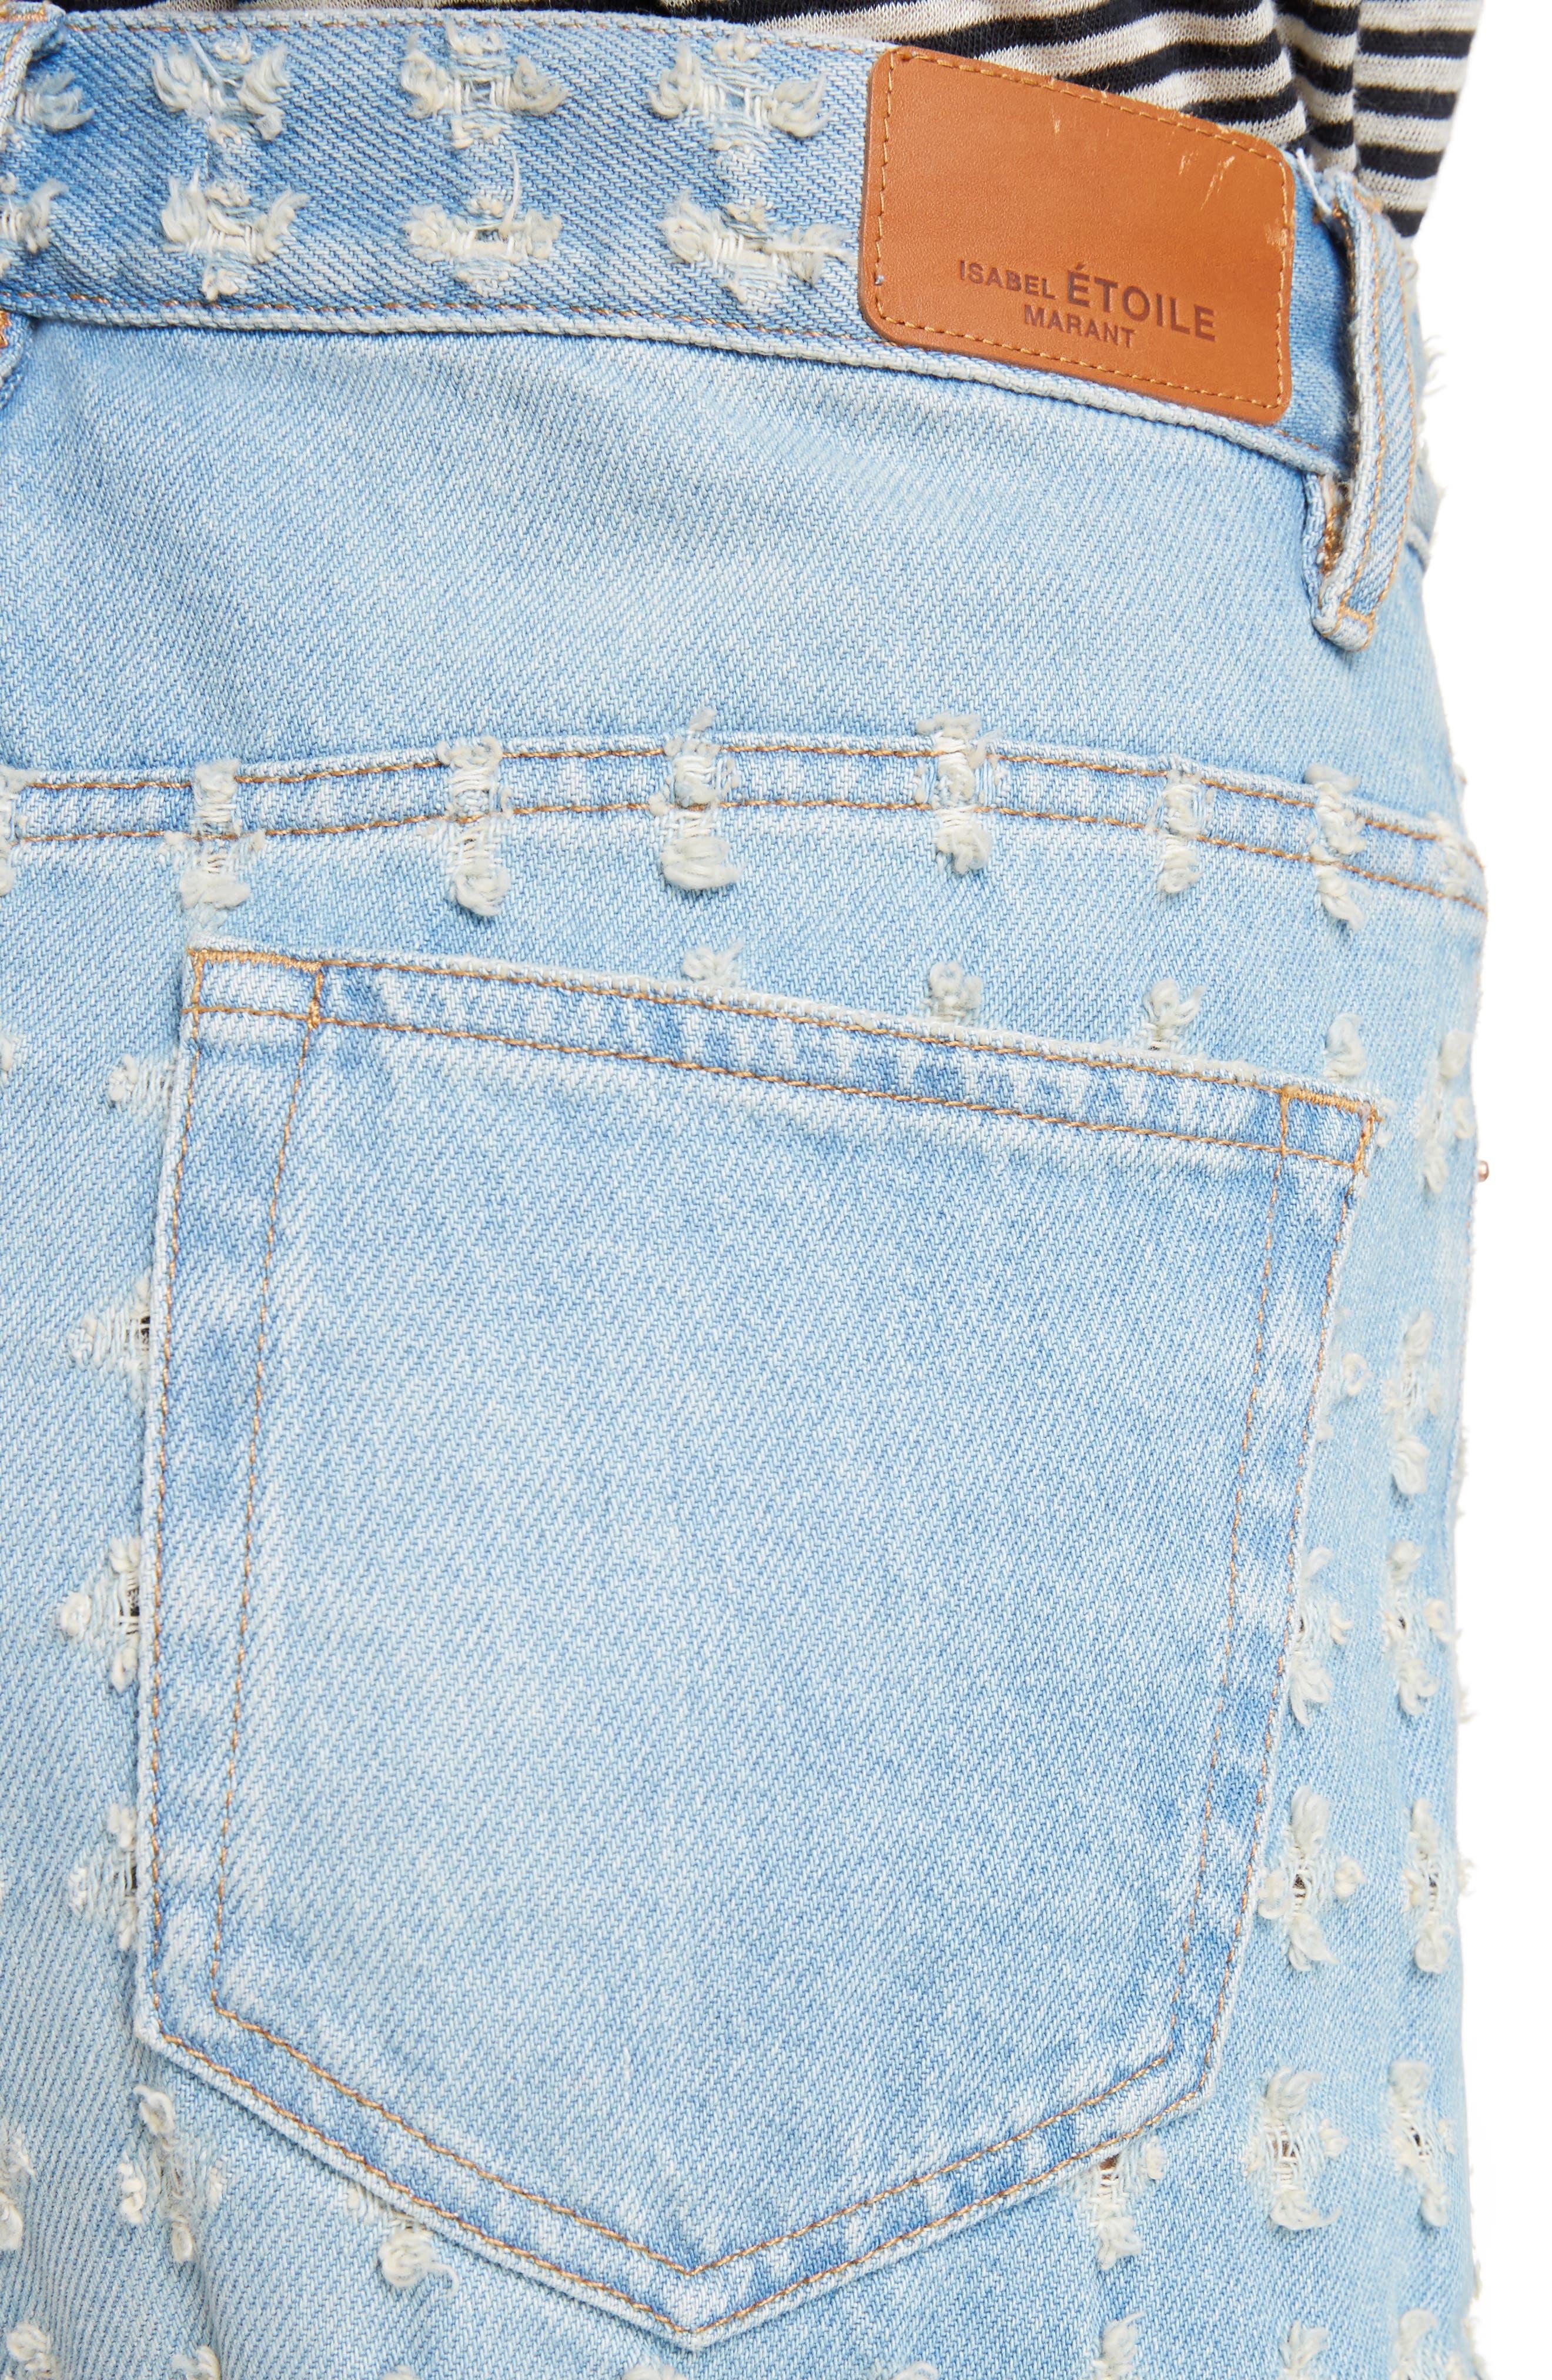 Isabel Marant Étoile Cory Cuffed Jeans,                             Alternate thumbnail 4, color,                             400